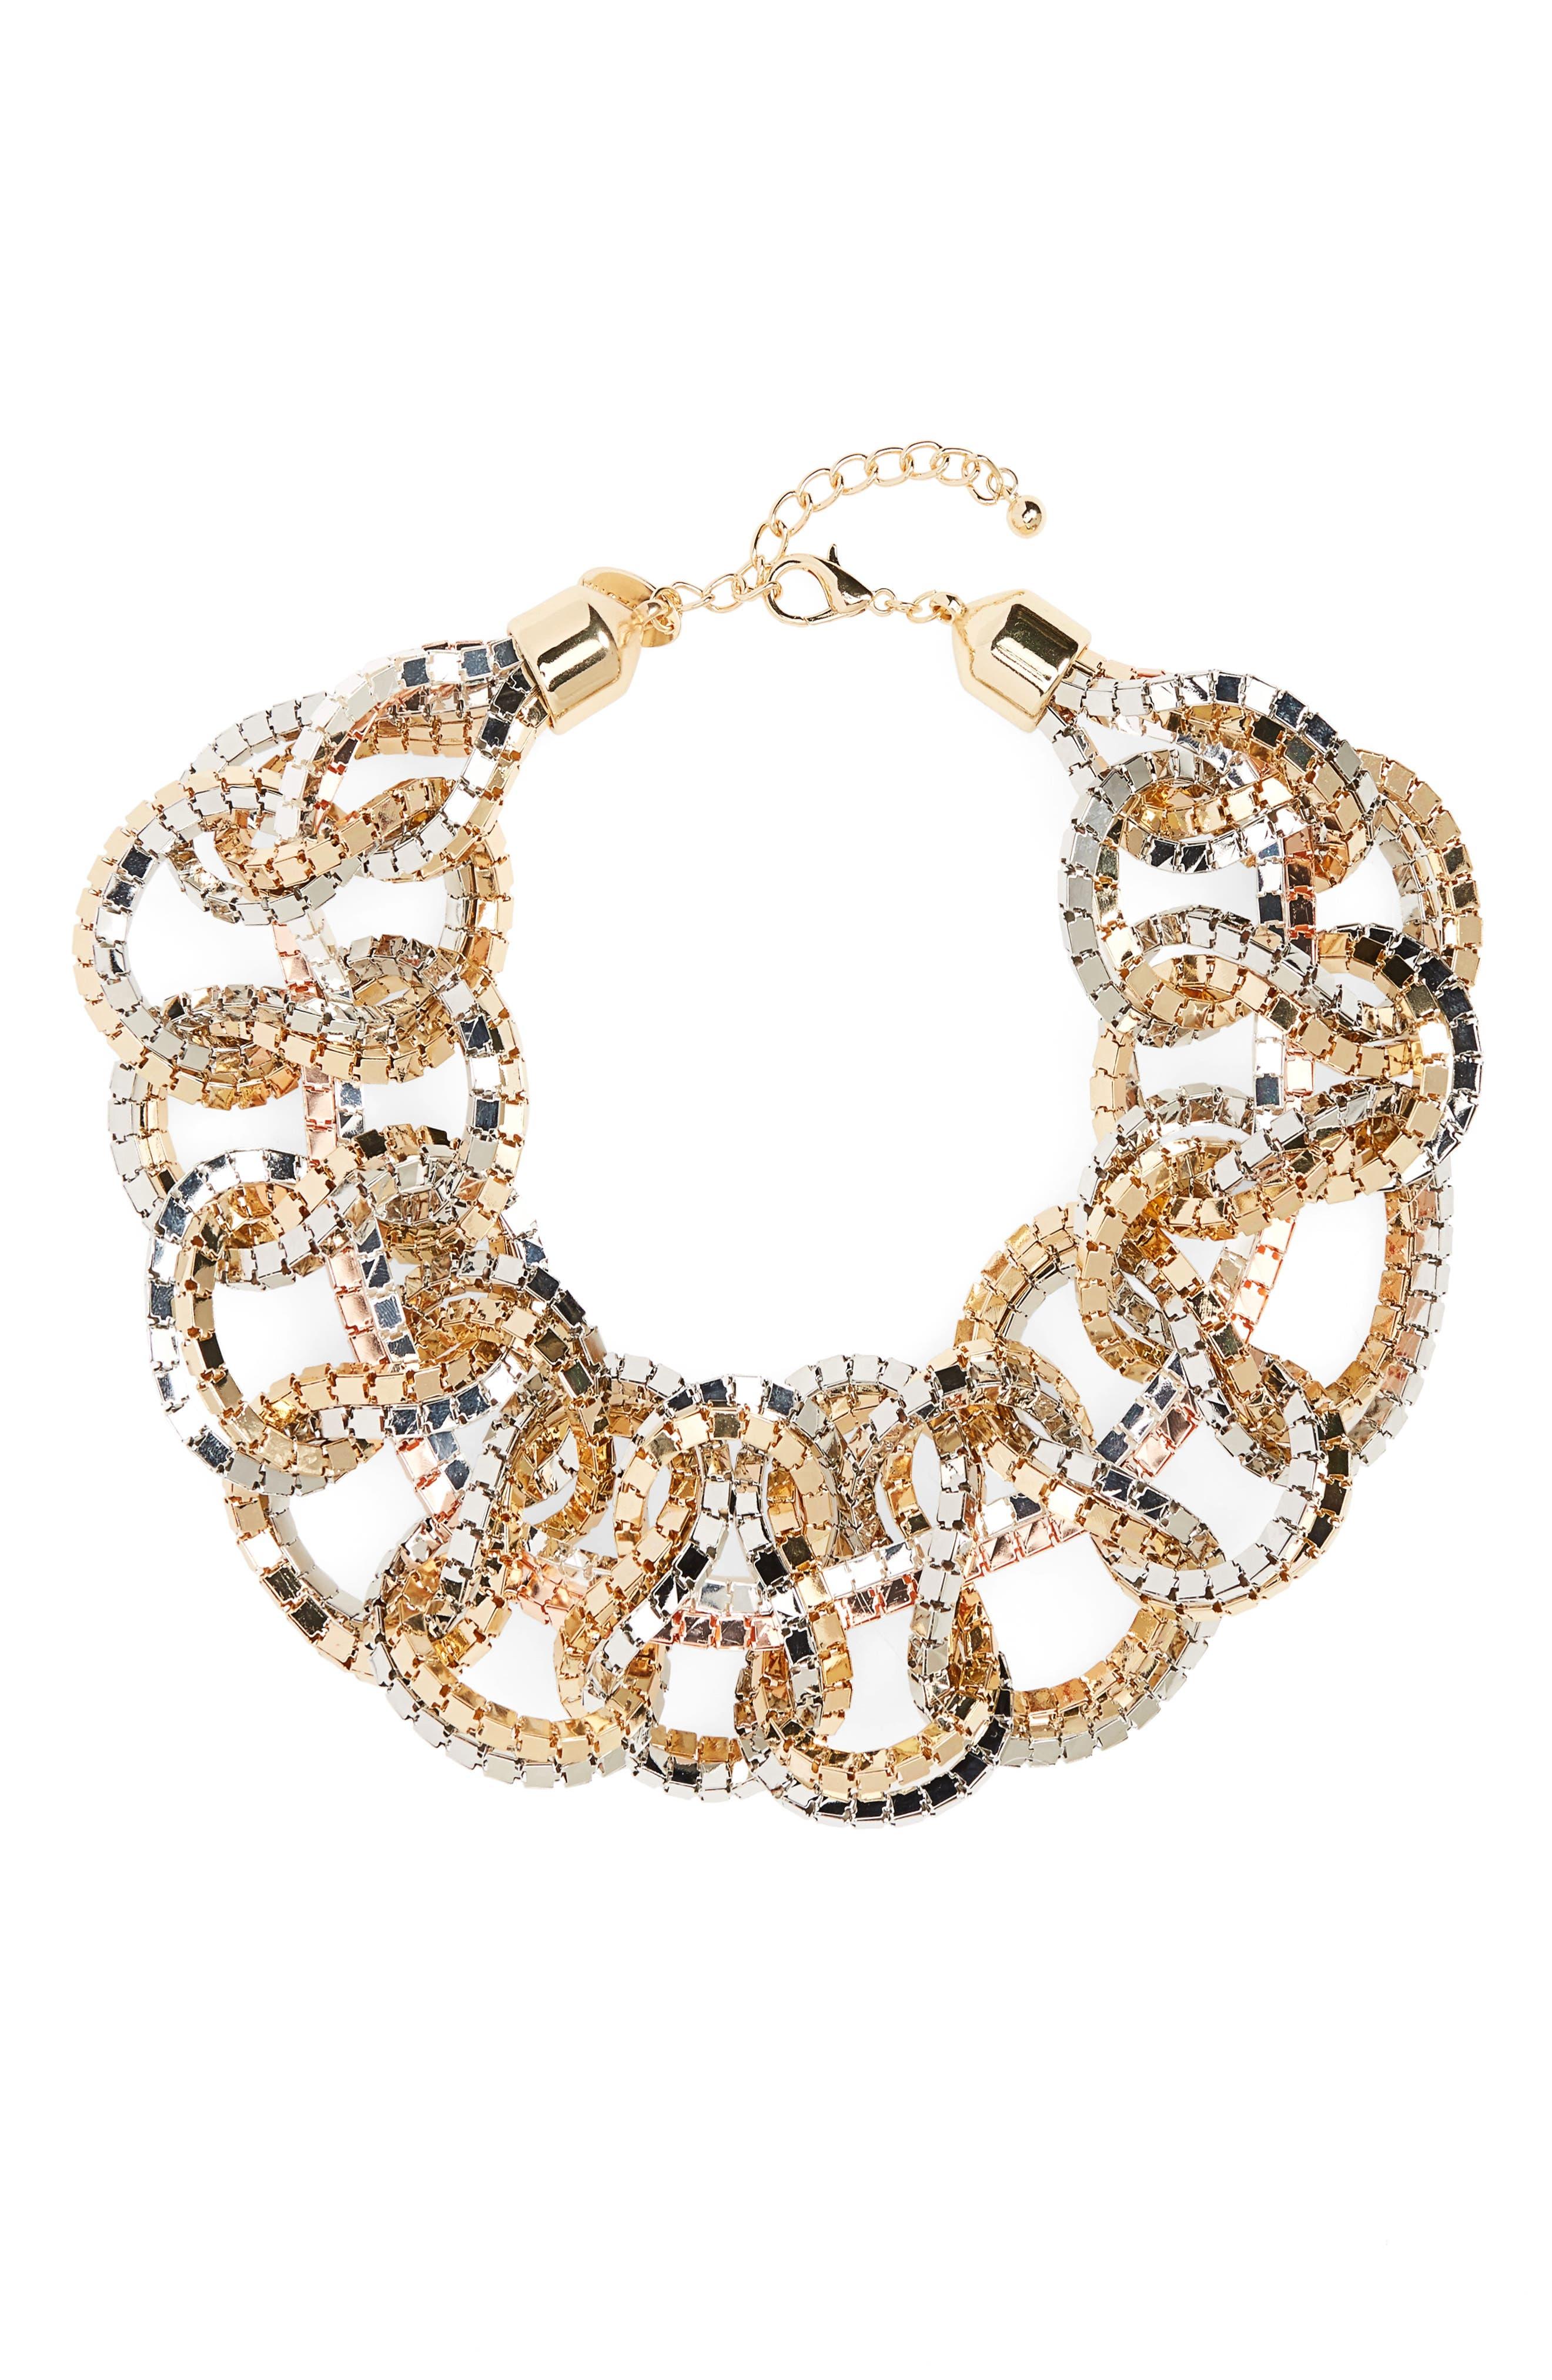 Box Chain Bib Necklace,                             Main thumbnail 1, color,                             040